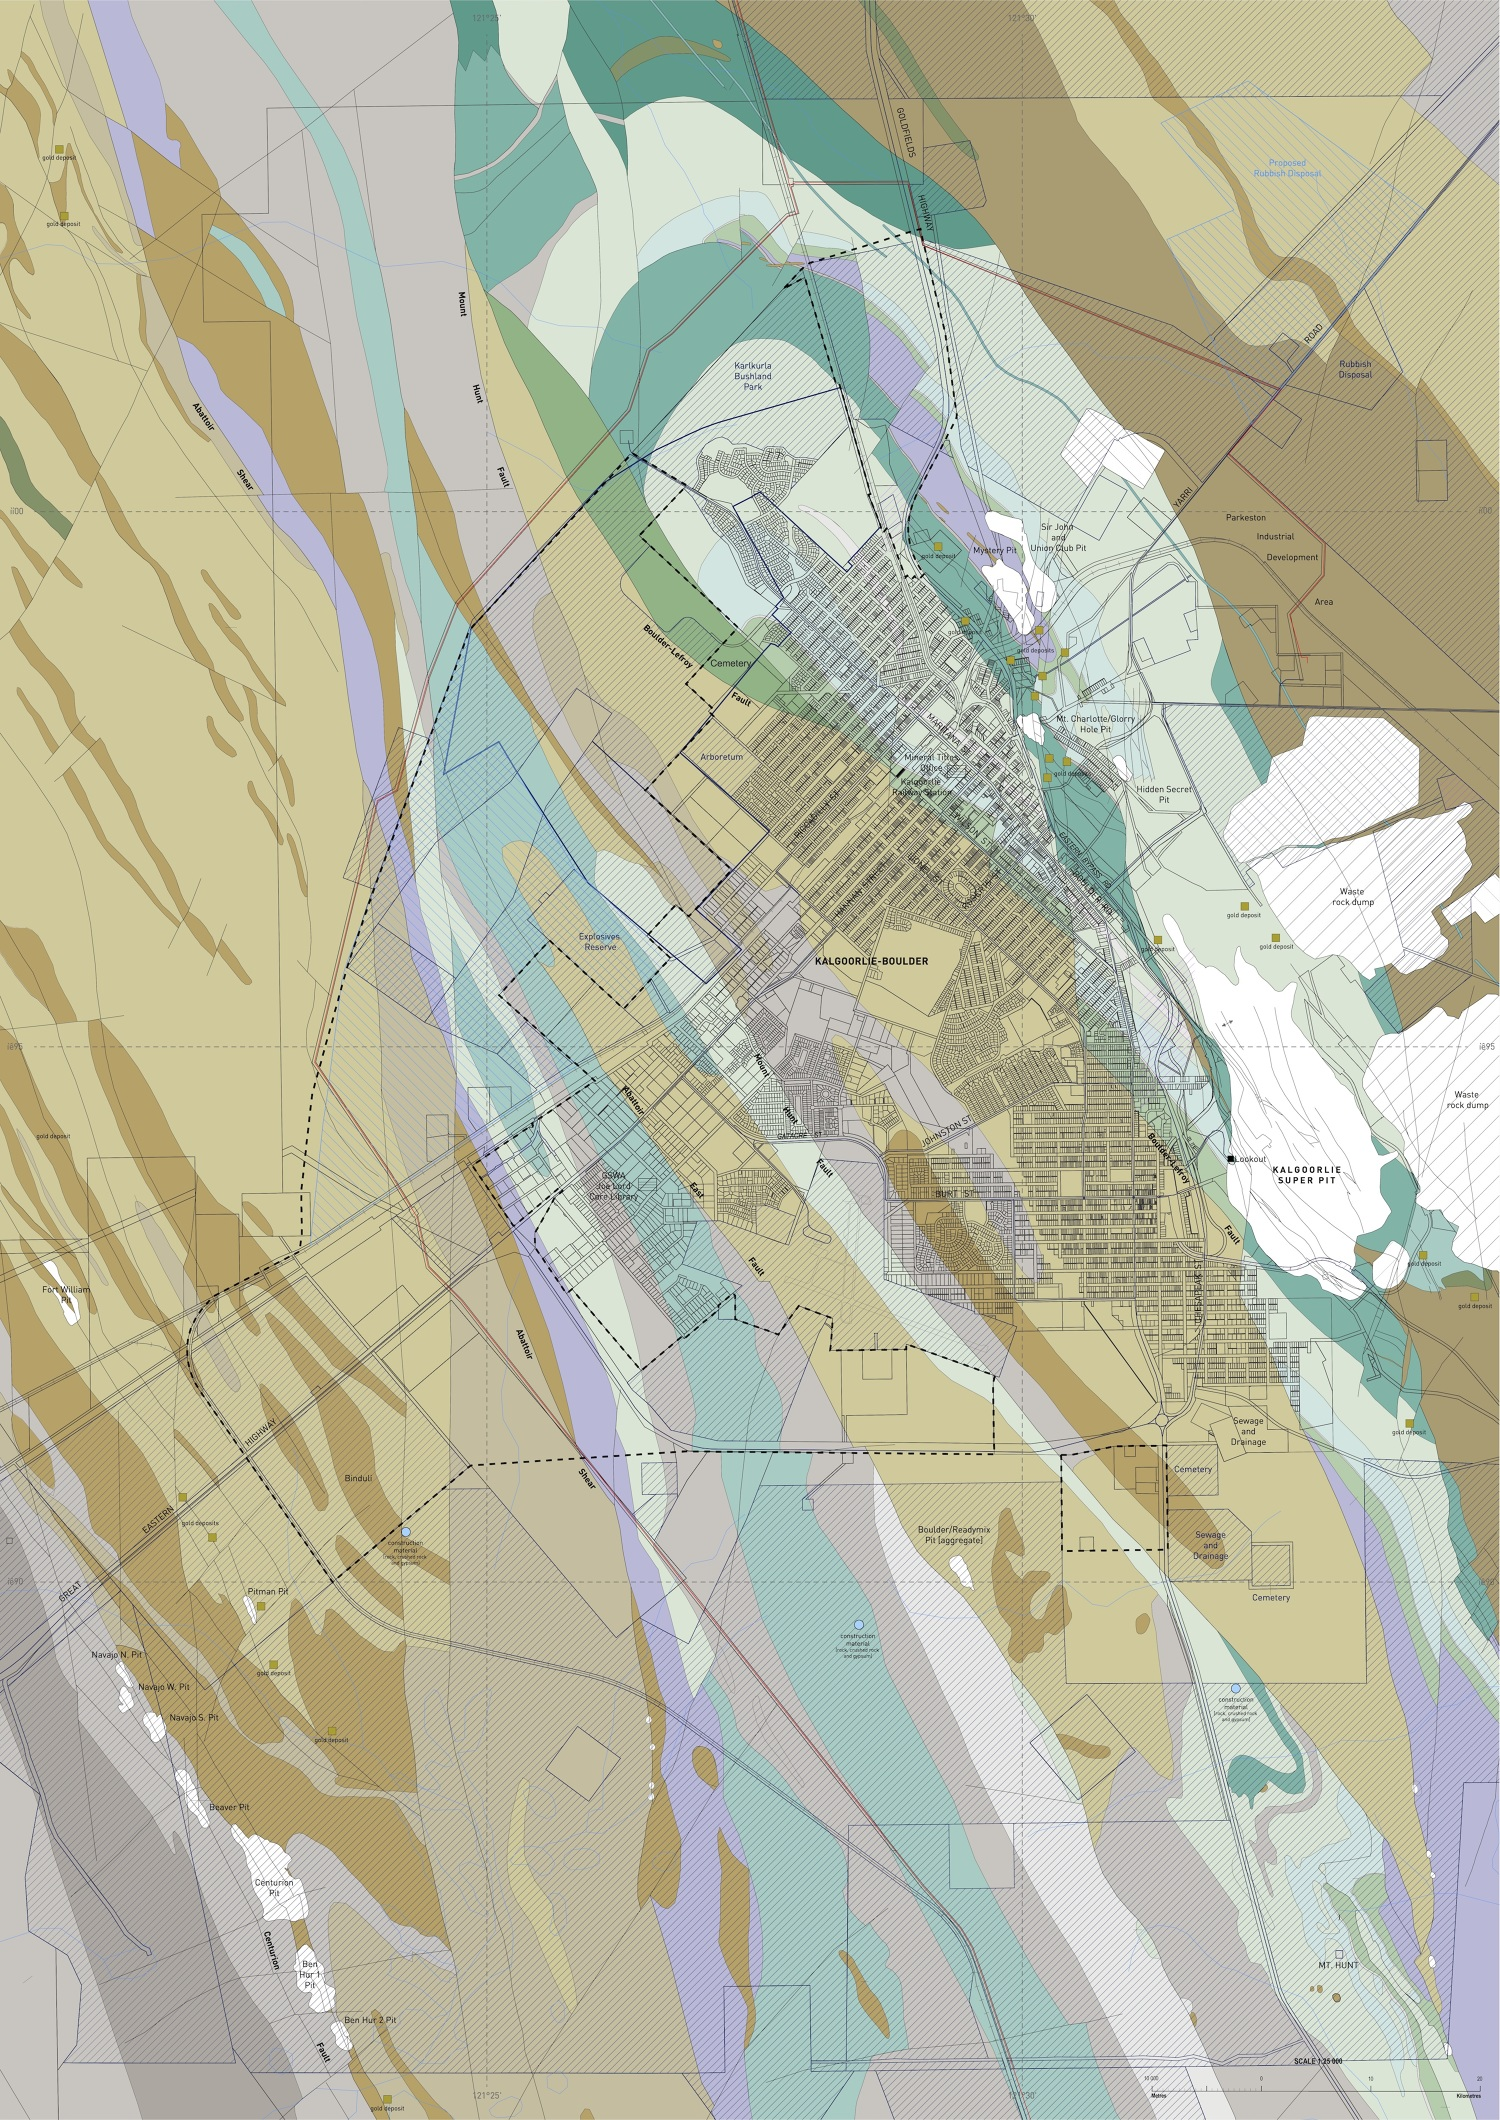 Urban Imaginaries Briallen Roberts ATLAS OF PLACES